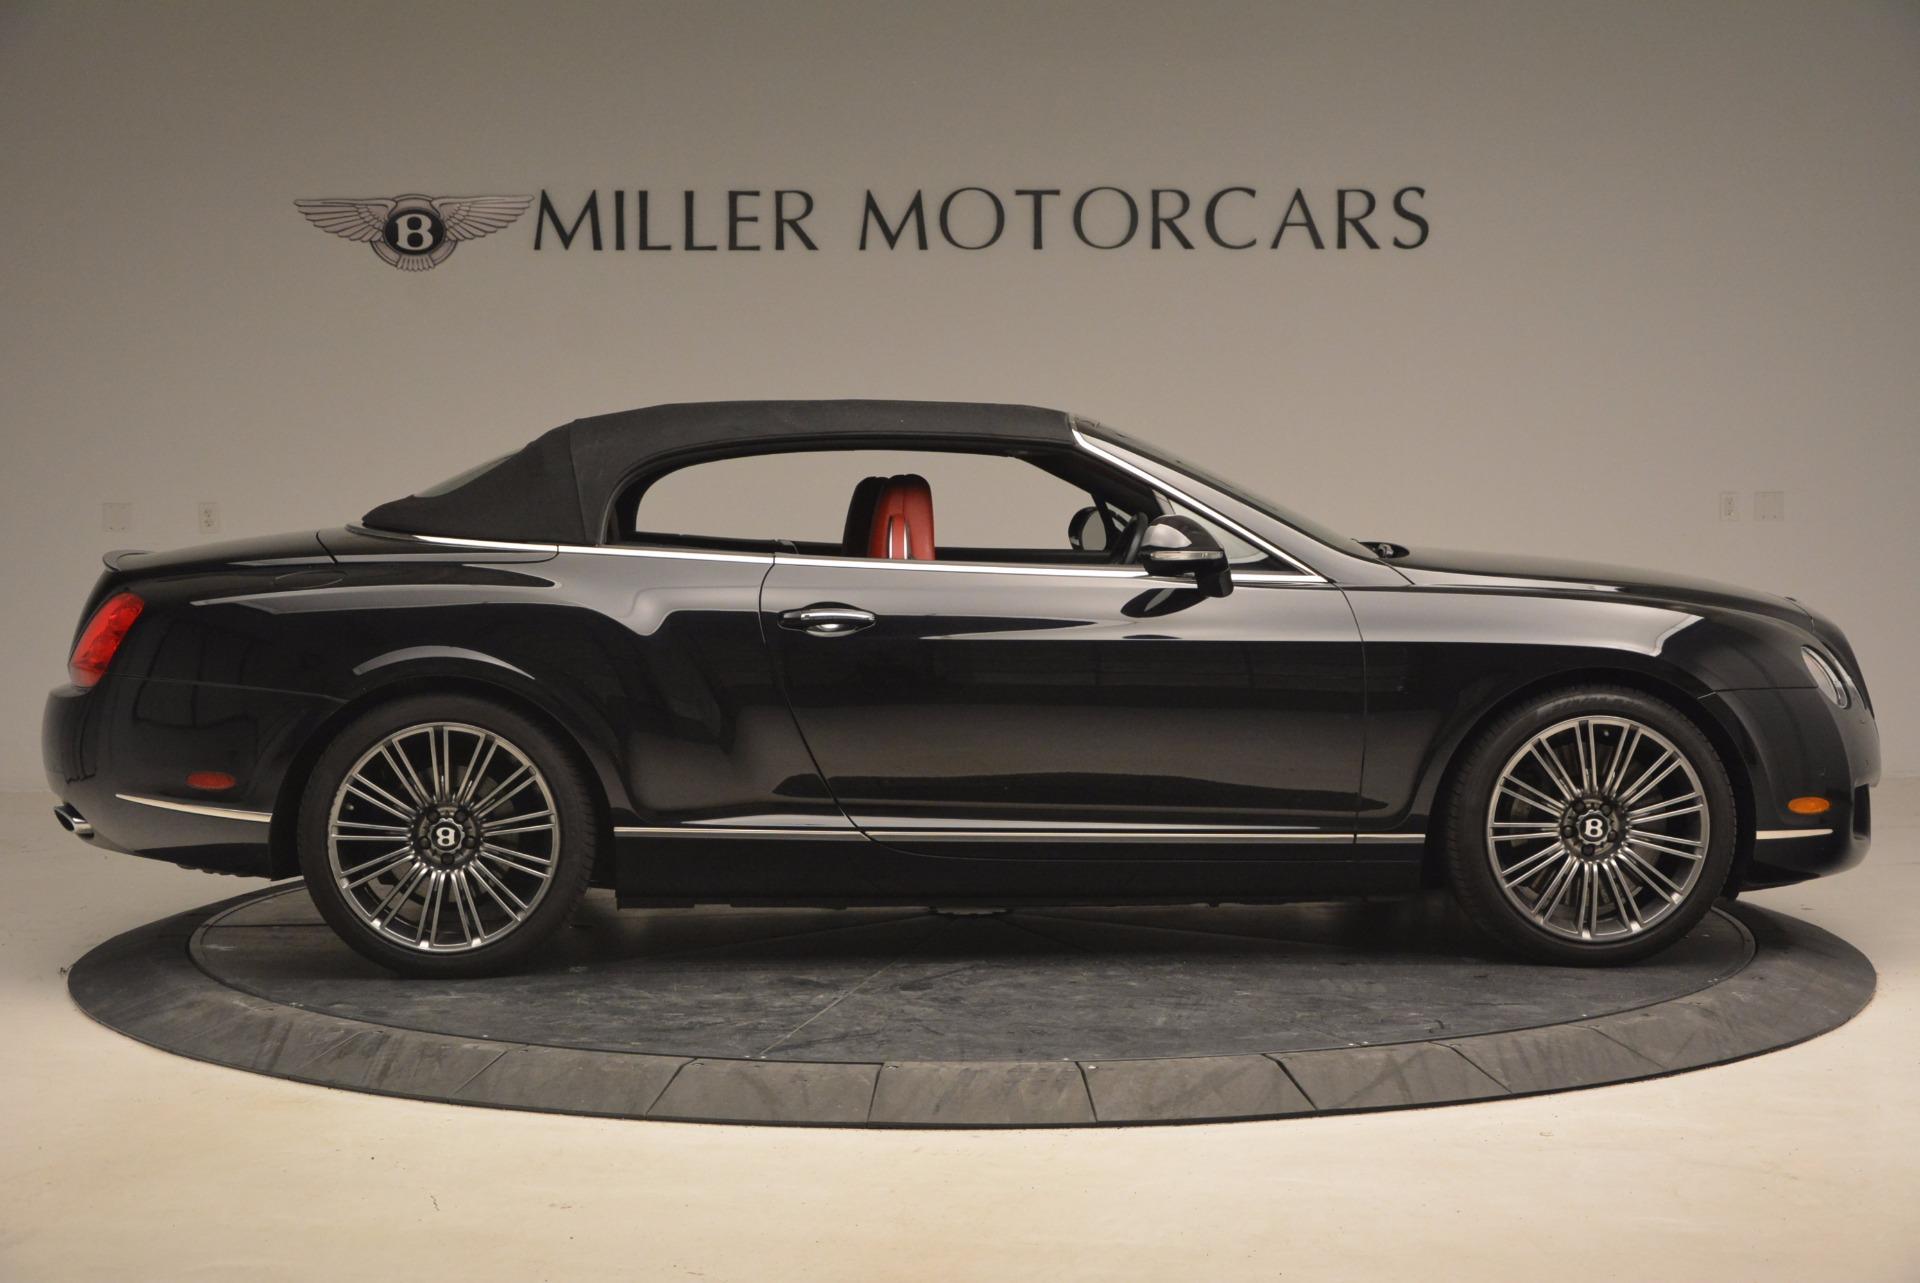 Used 2010 Bentley Continental GT Speed For Sale In Westport, CT 1298_p22